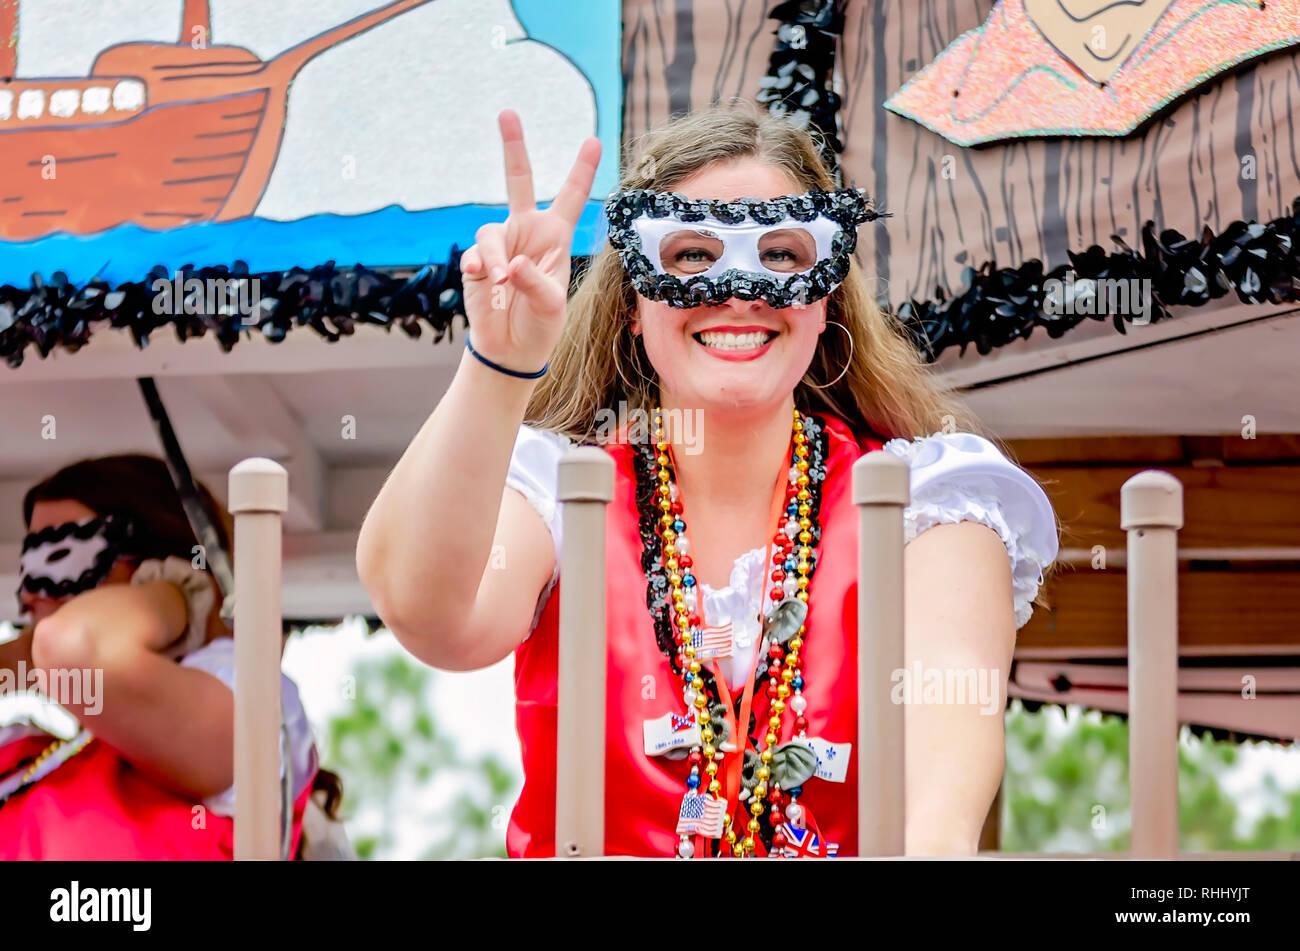 3696d4f13e0 Woman Wearing Mardi Gras Mask Stock Photos   Woman Wearing Mardi ...